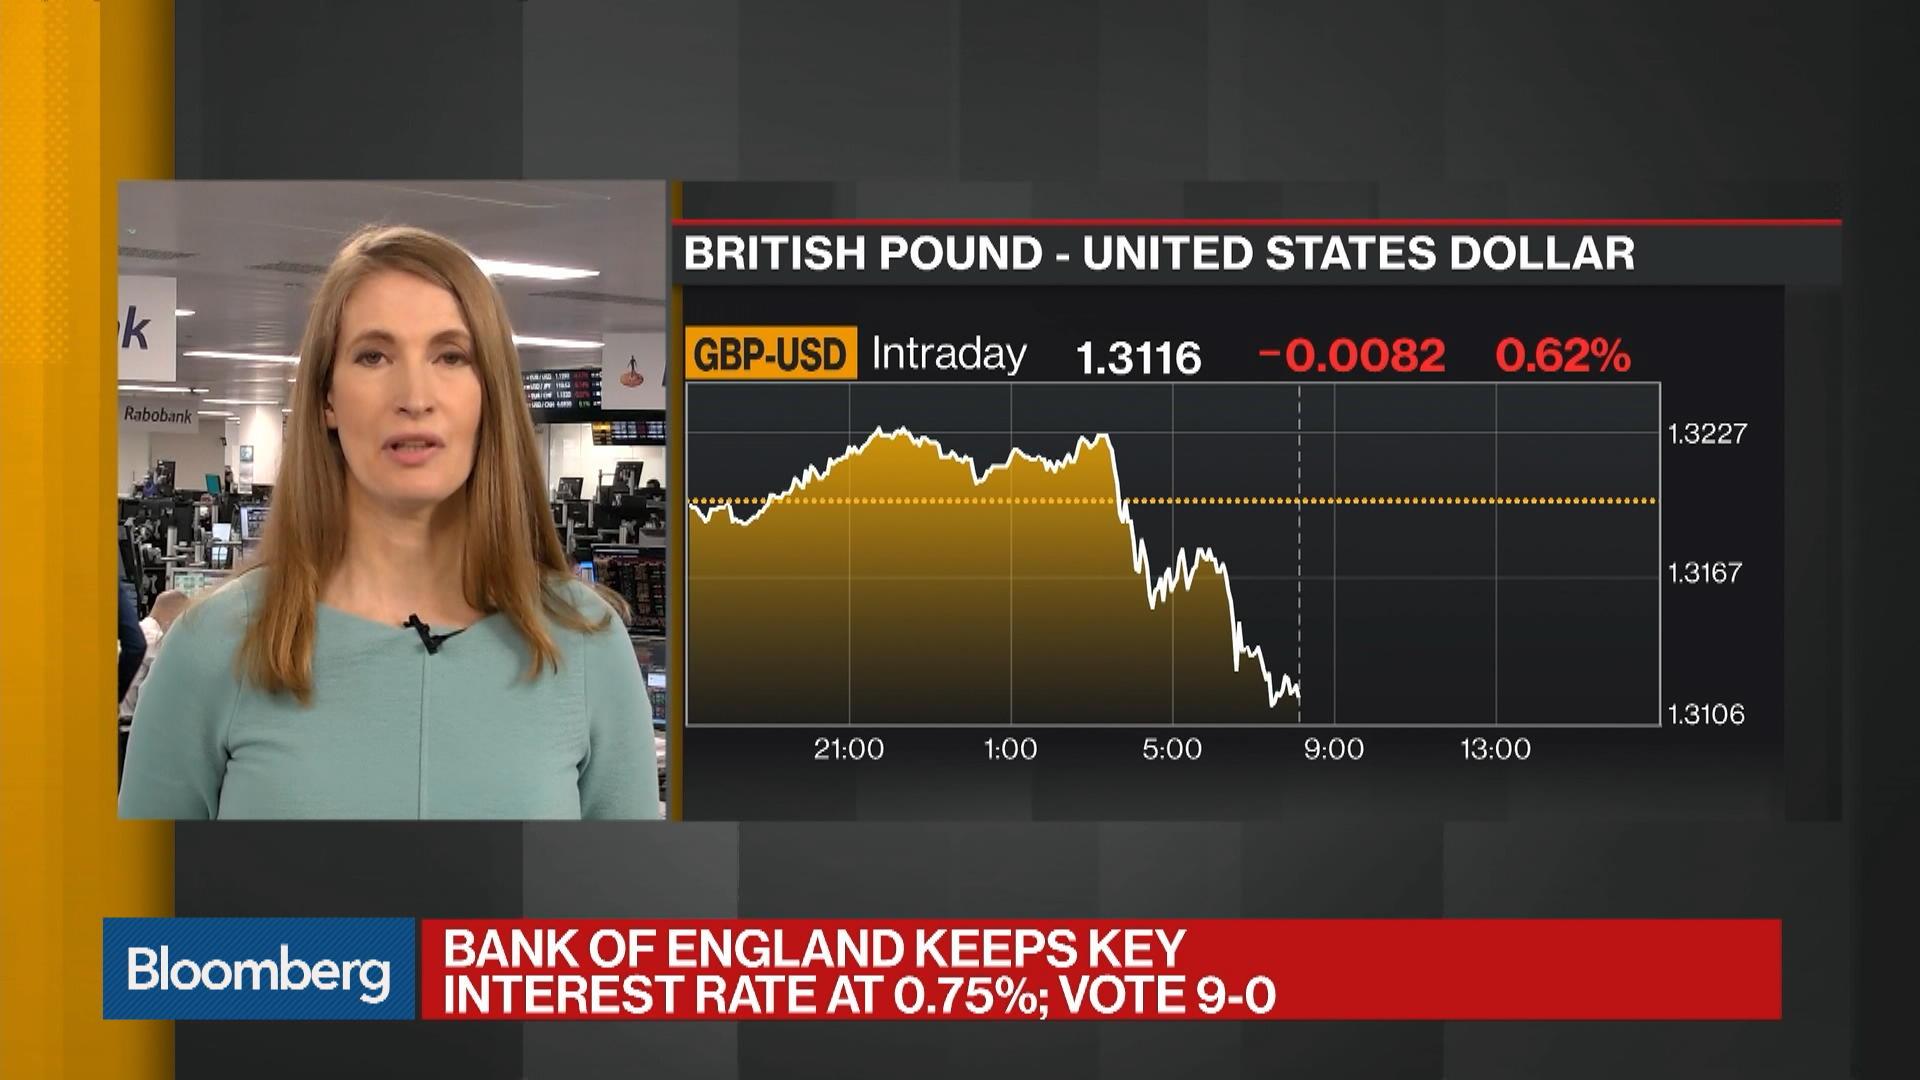 Sterling Downside Reflects Market's Hard Brexit Concerns, Foley Says